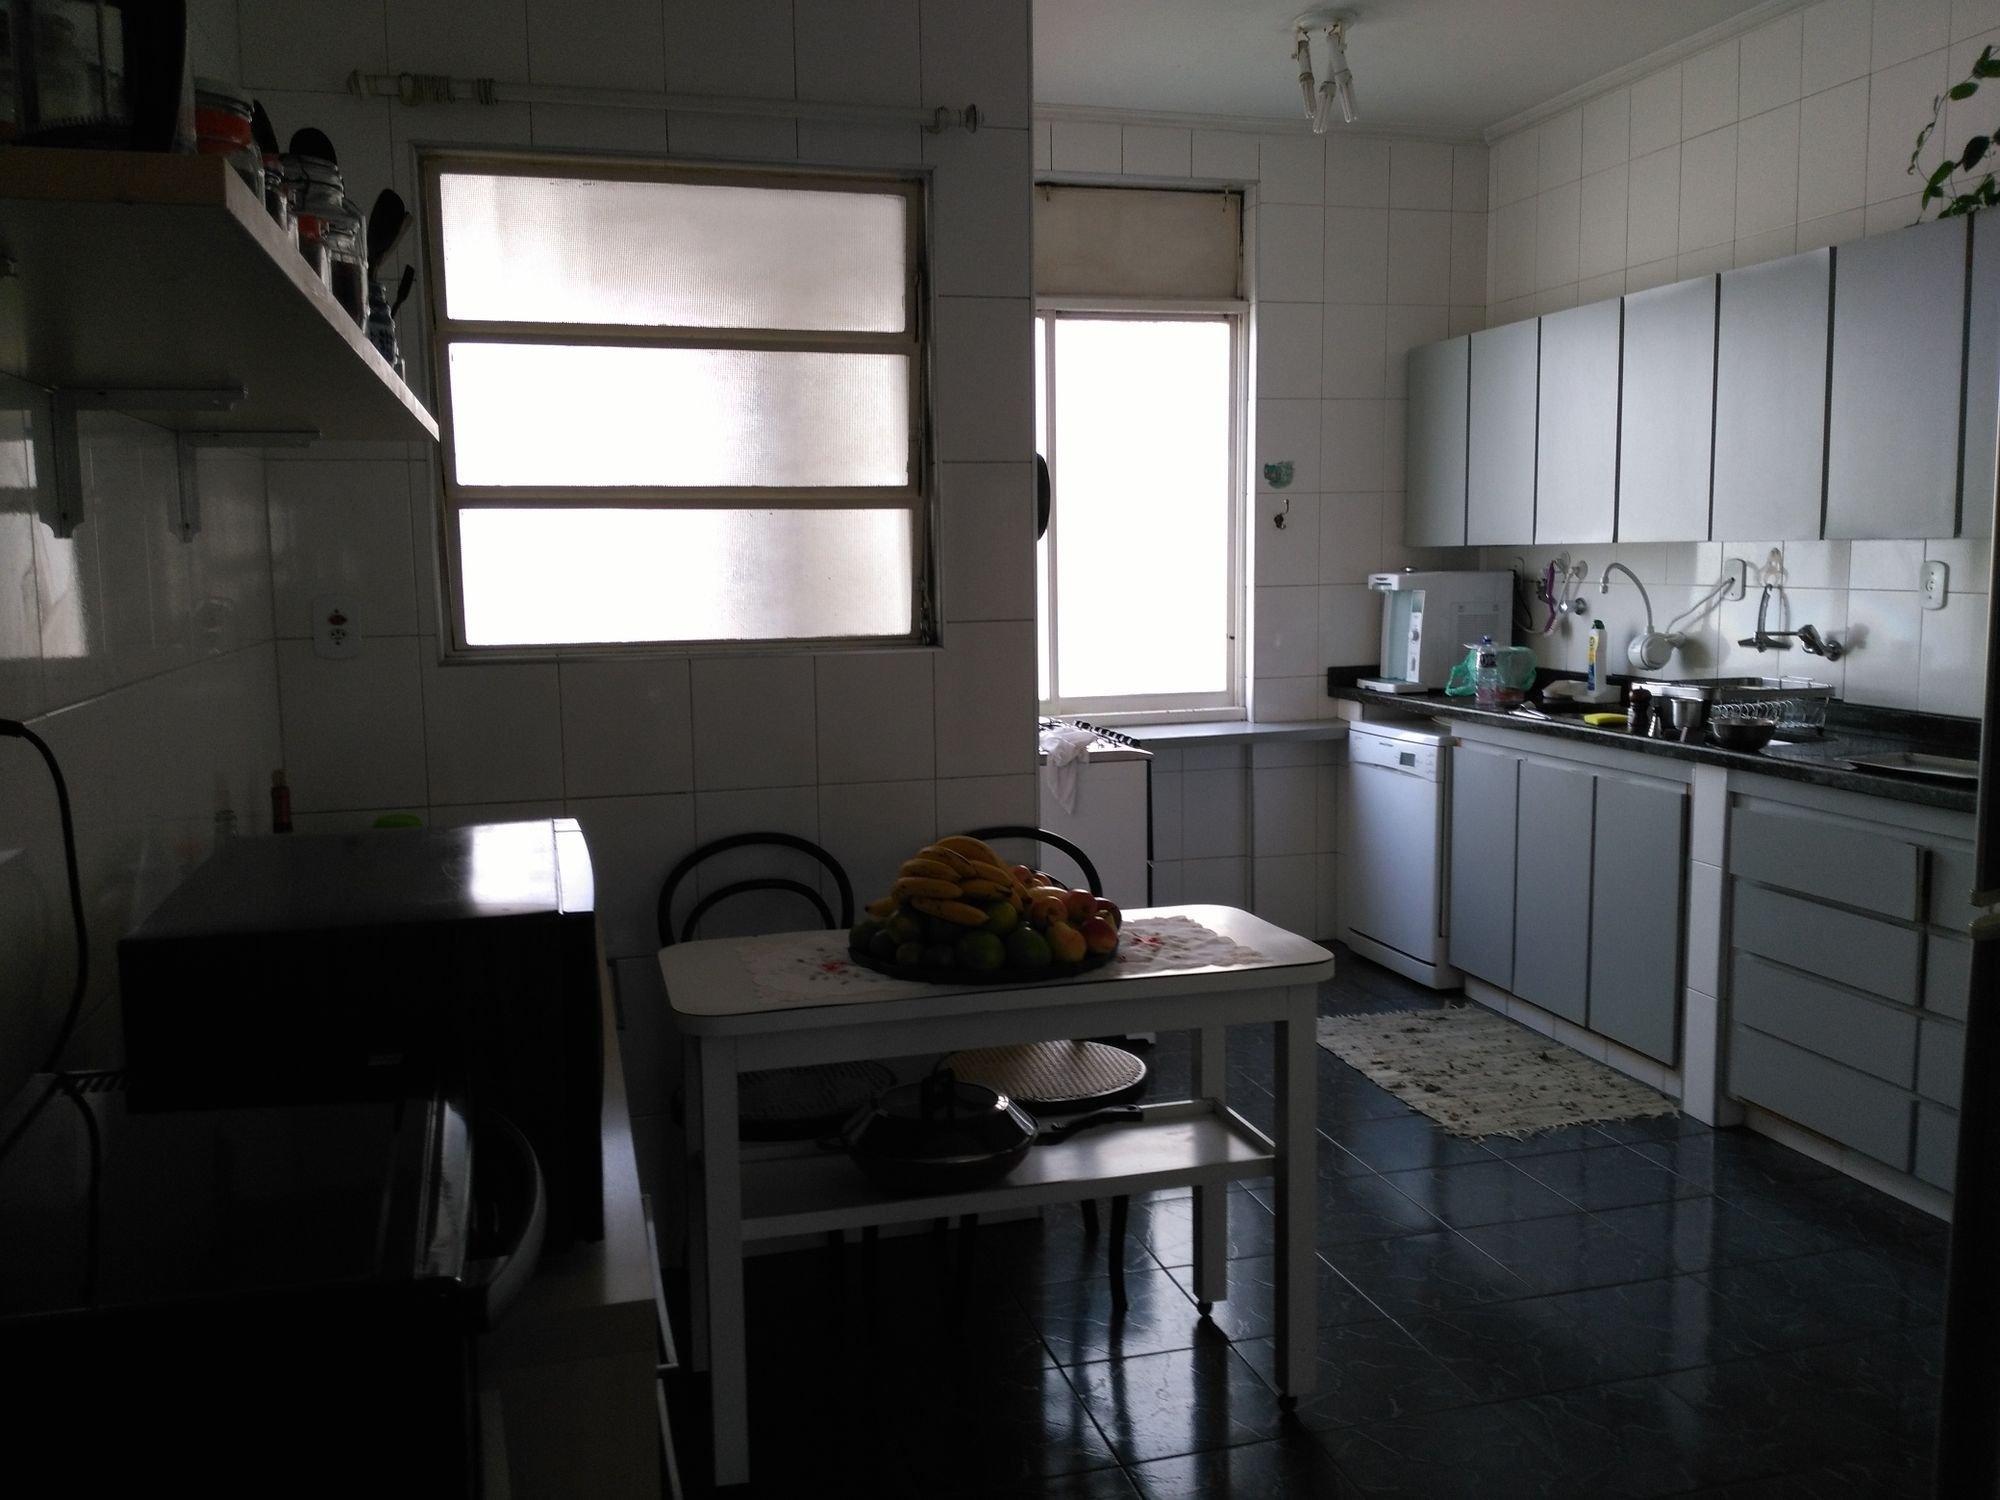 Foto de Cozinha com garrafa, mesa de jantar, xícara